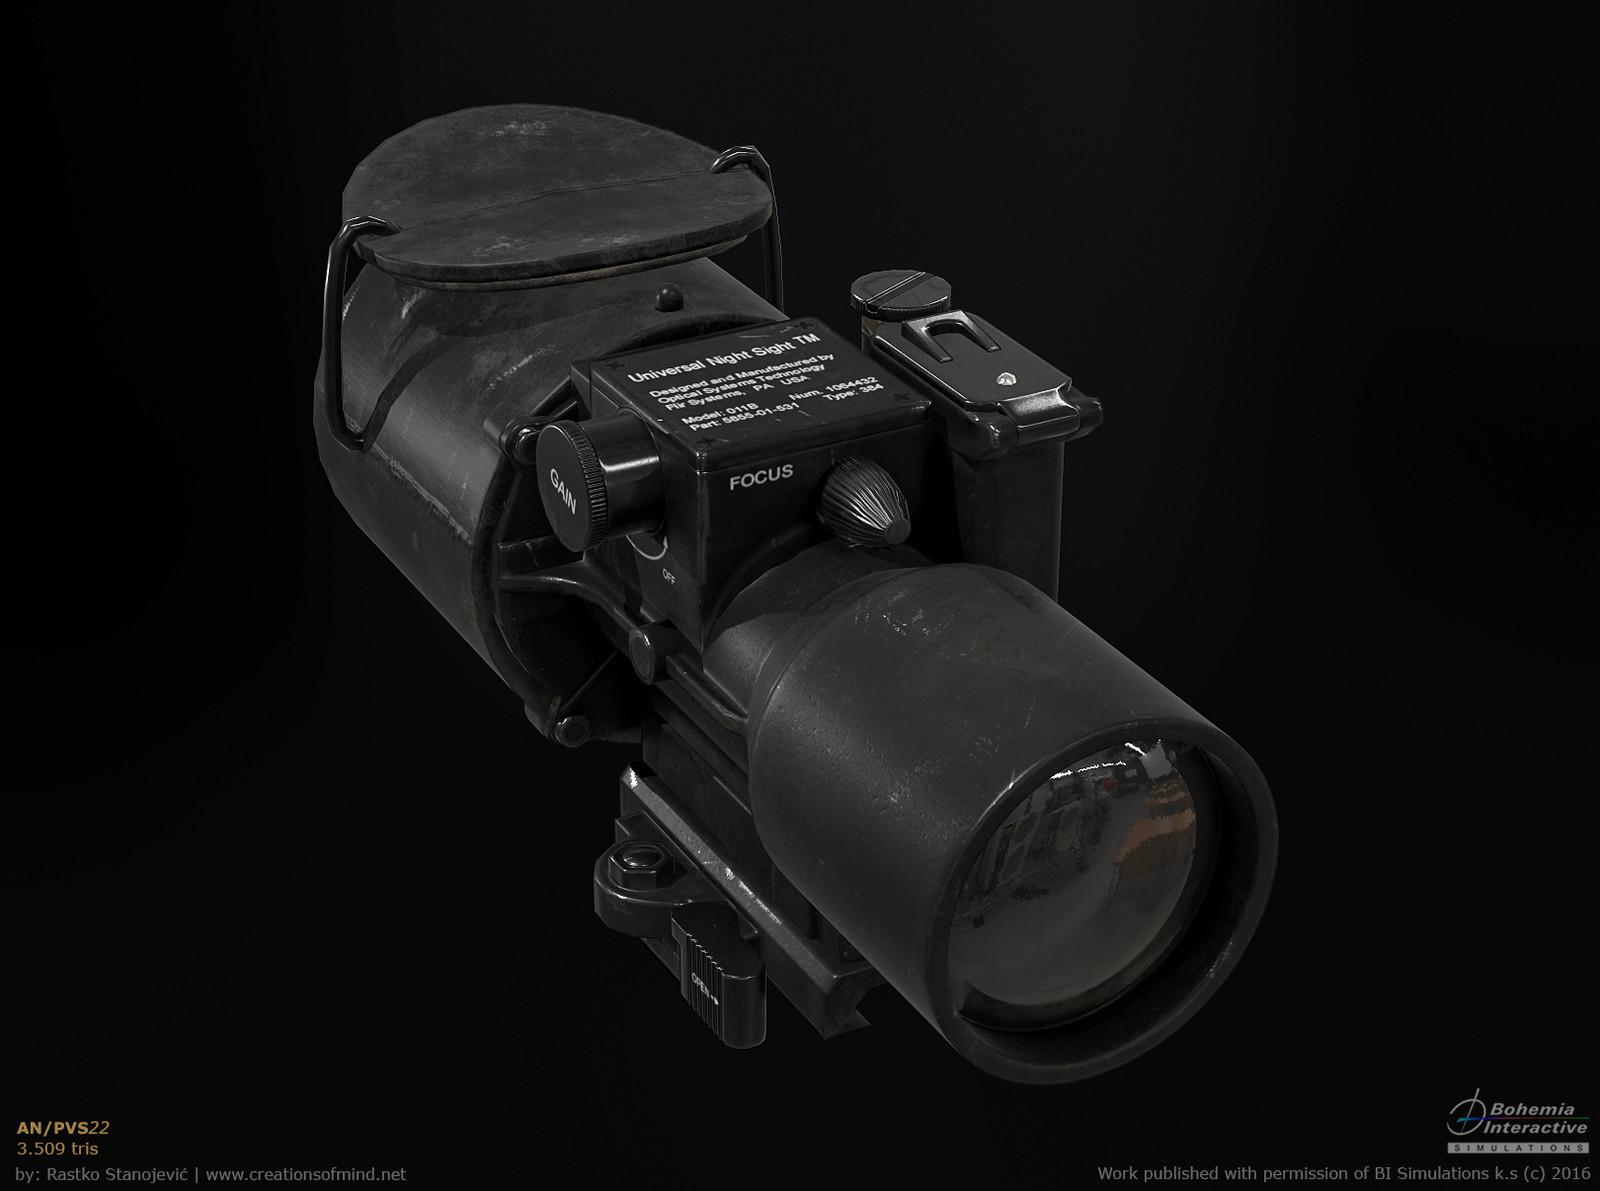 AN/PVS-22 real time render | 3.509 tris